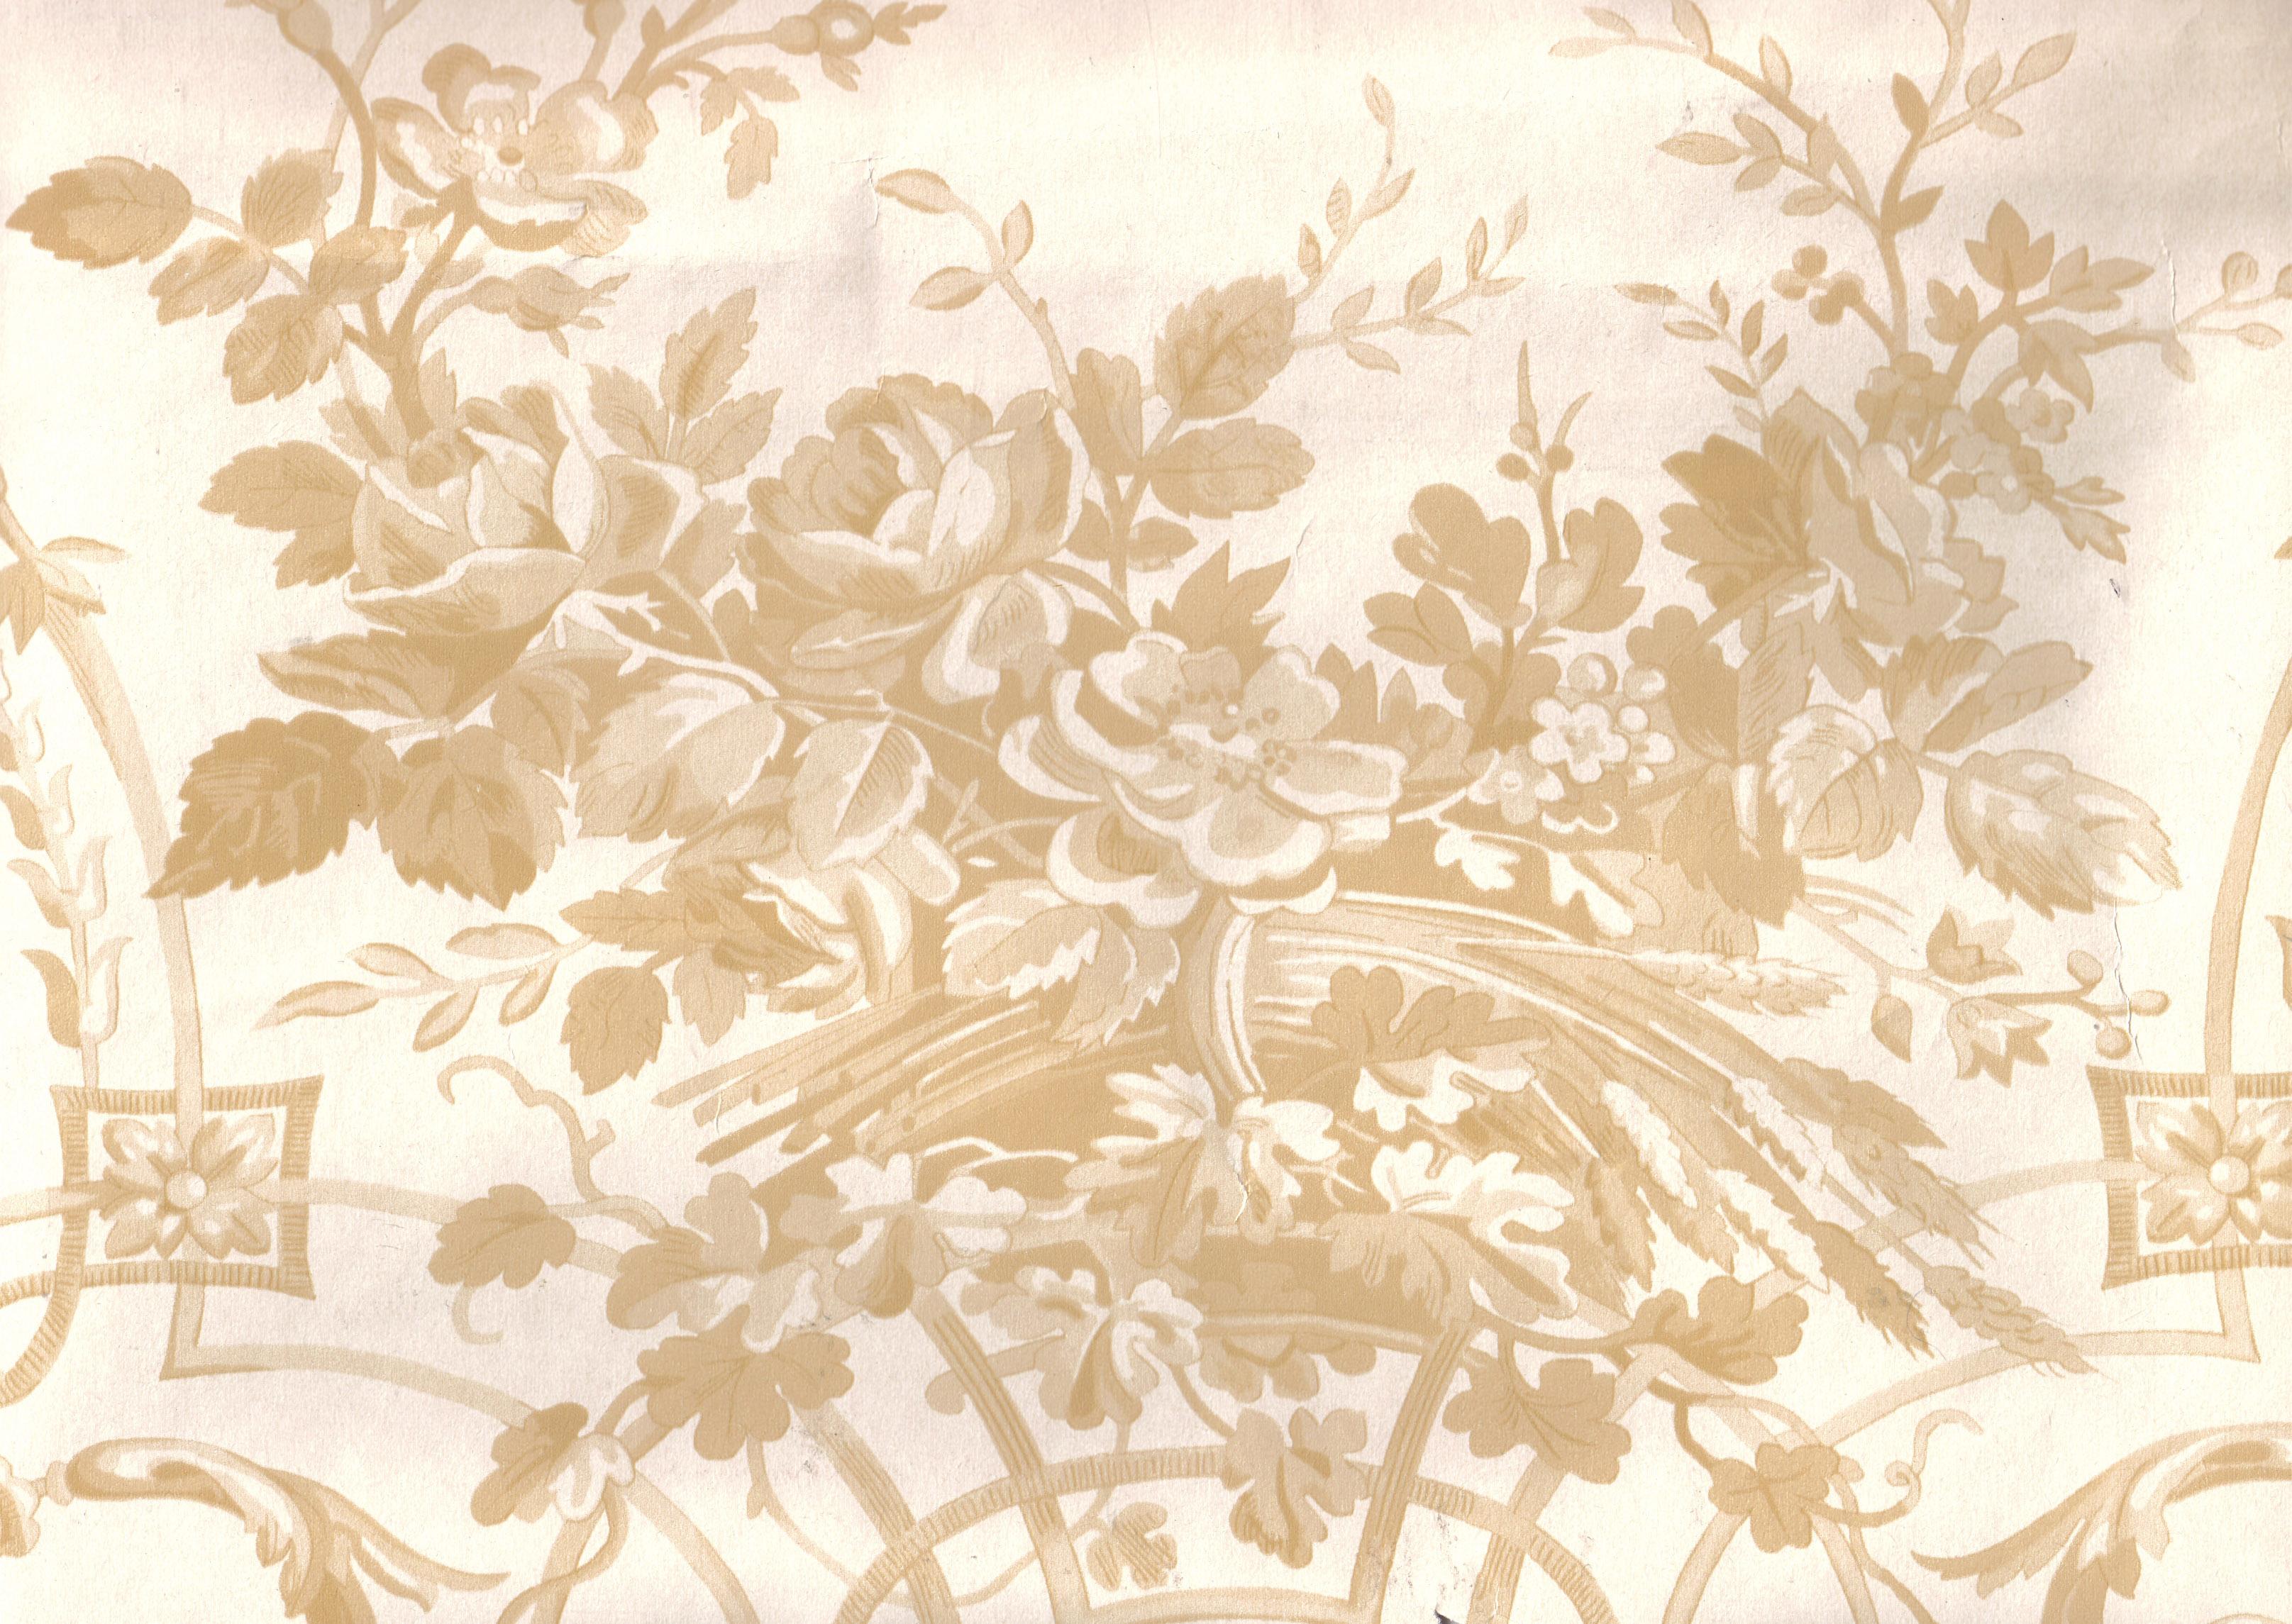 Texture 2 - fabric pattern